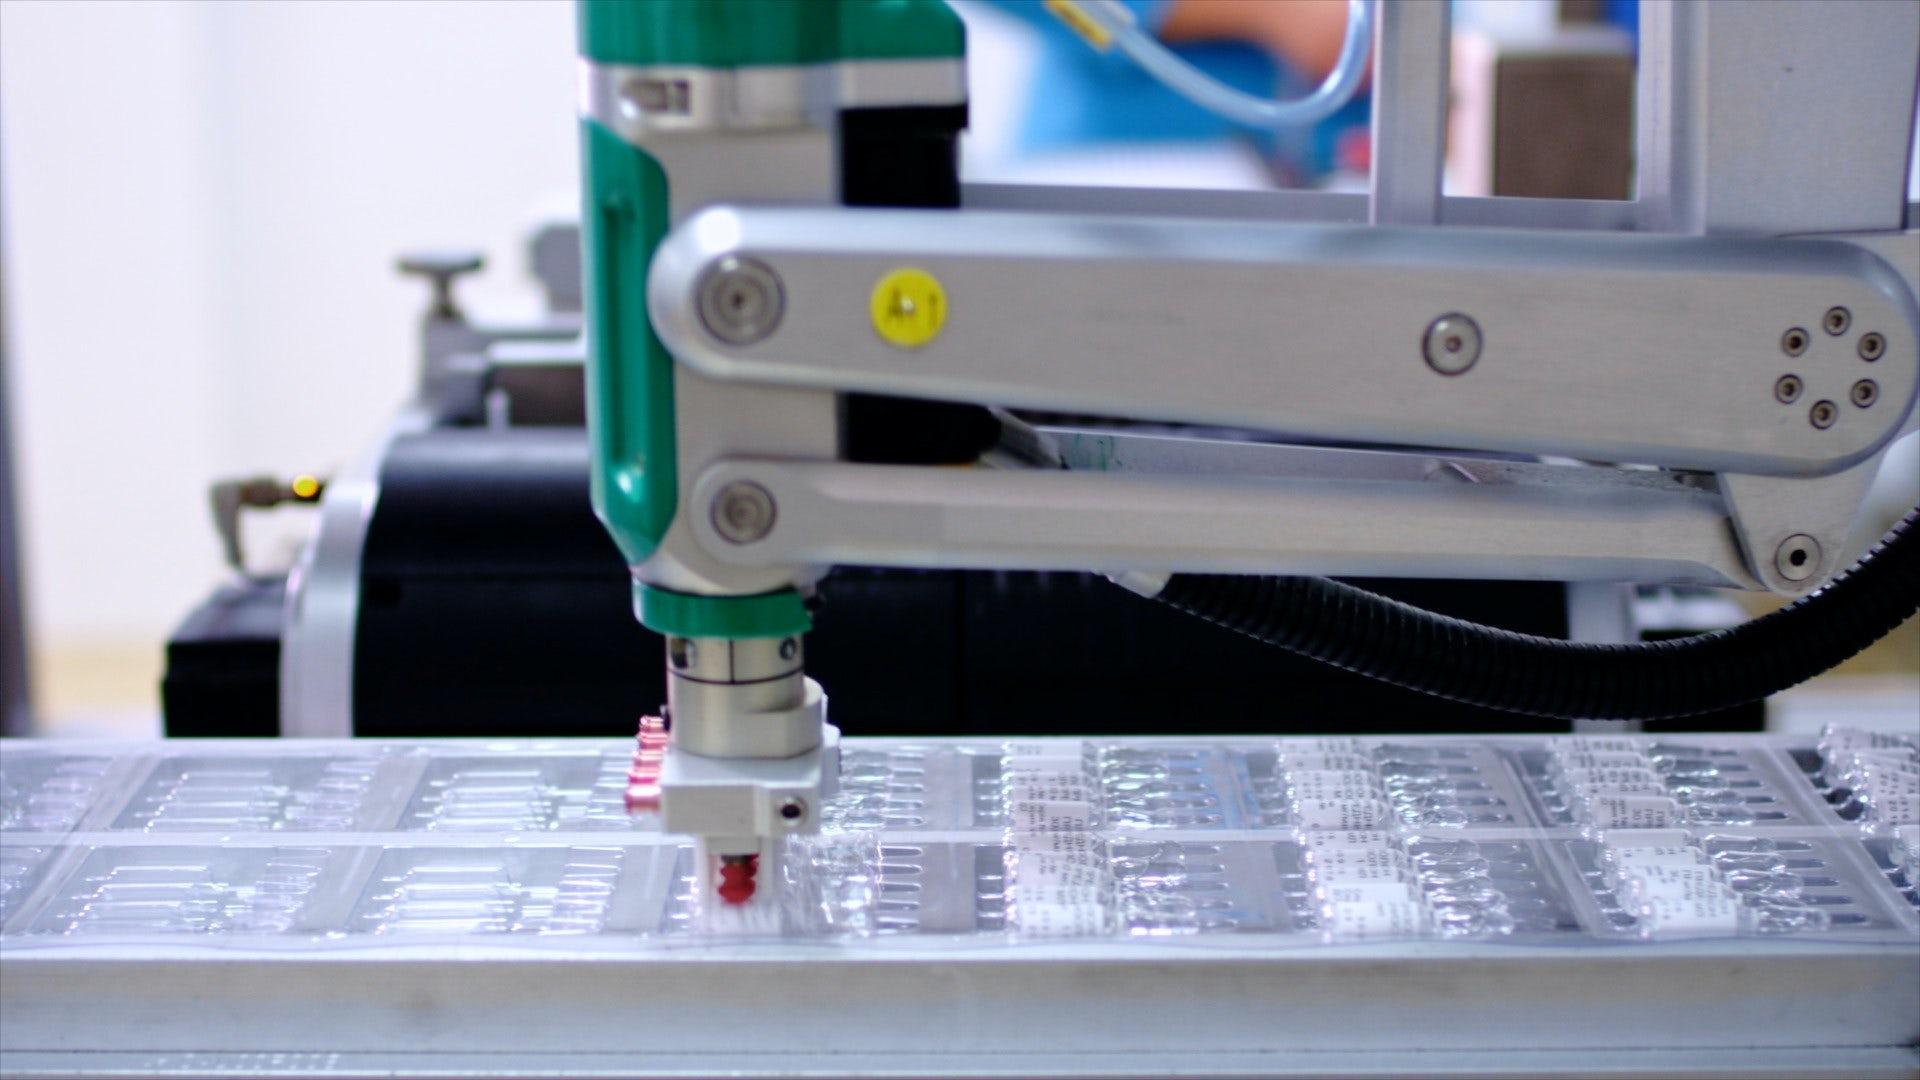 HG INDUSTRIAL HEADER Industriele automatisering